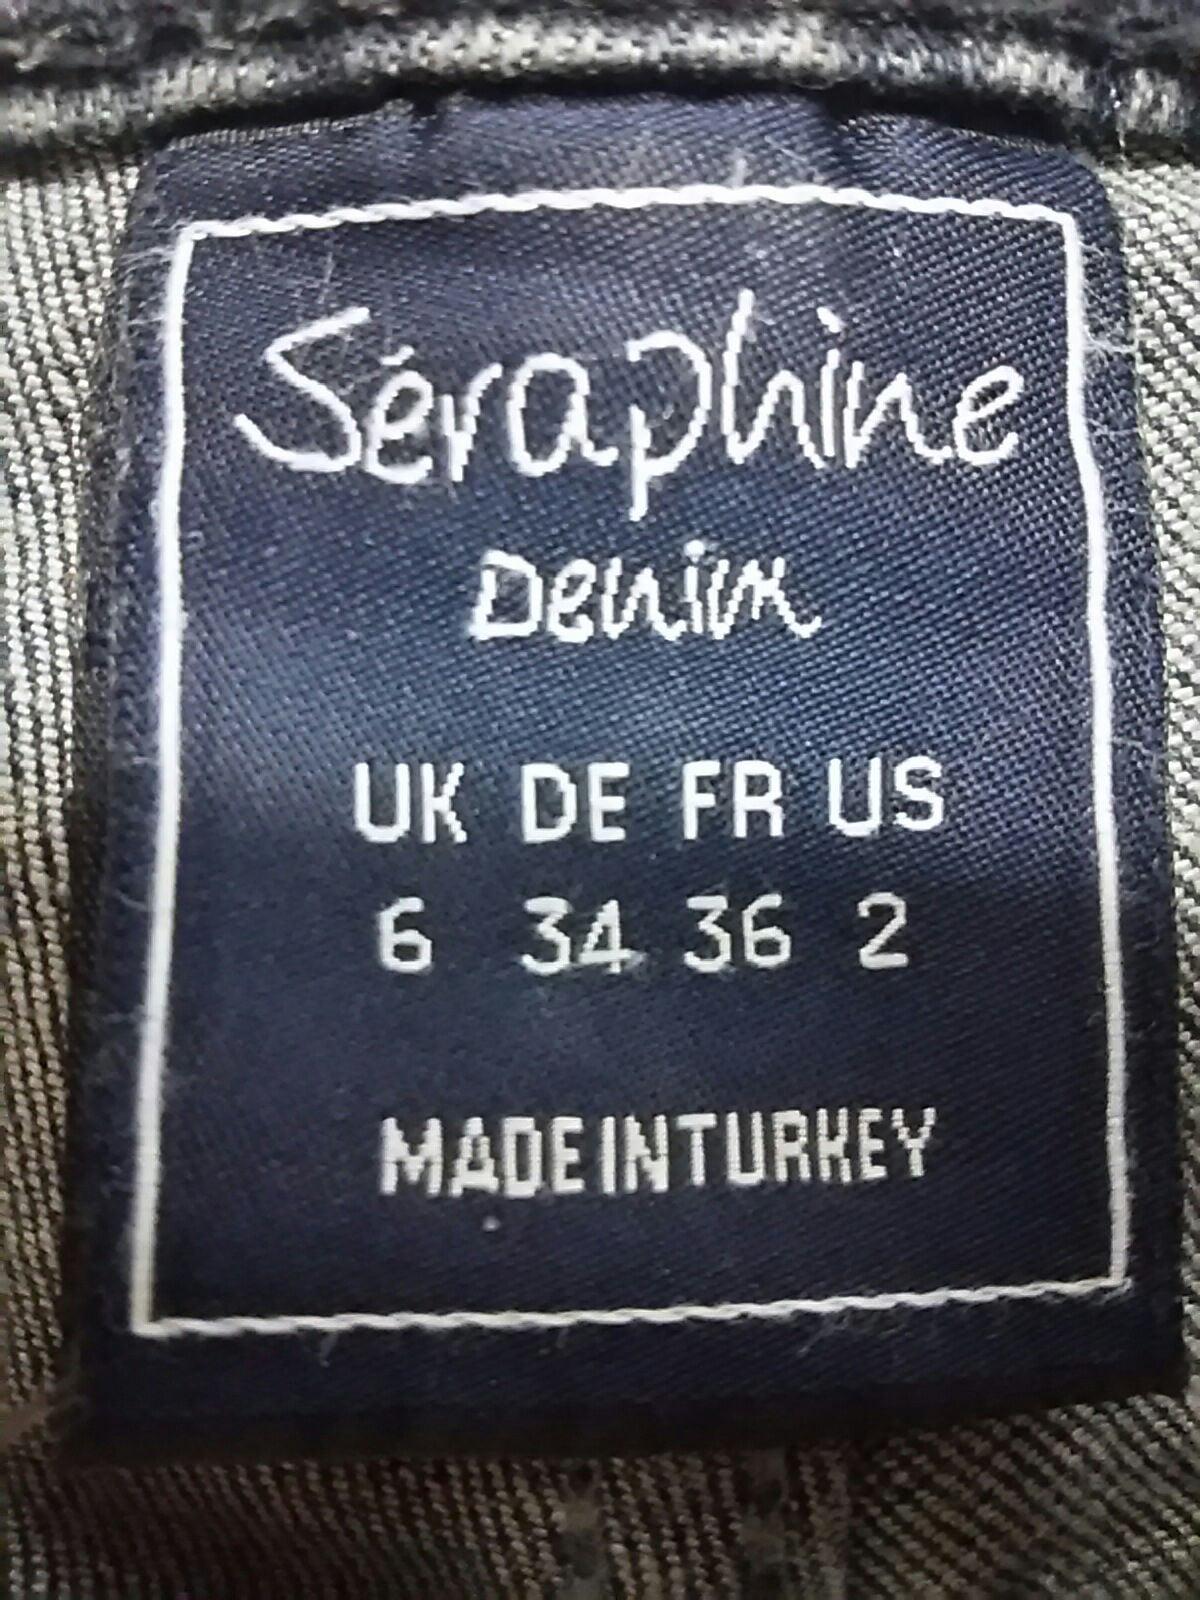 Seraphine(セラフィン)のパンツ